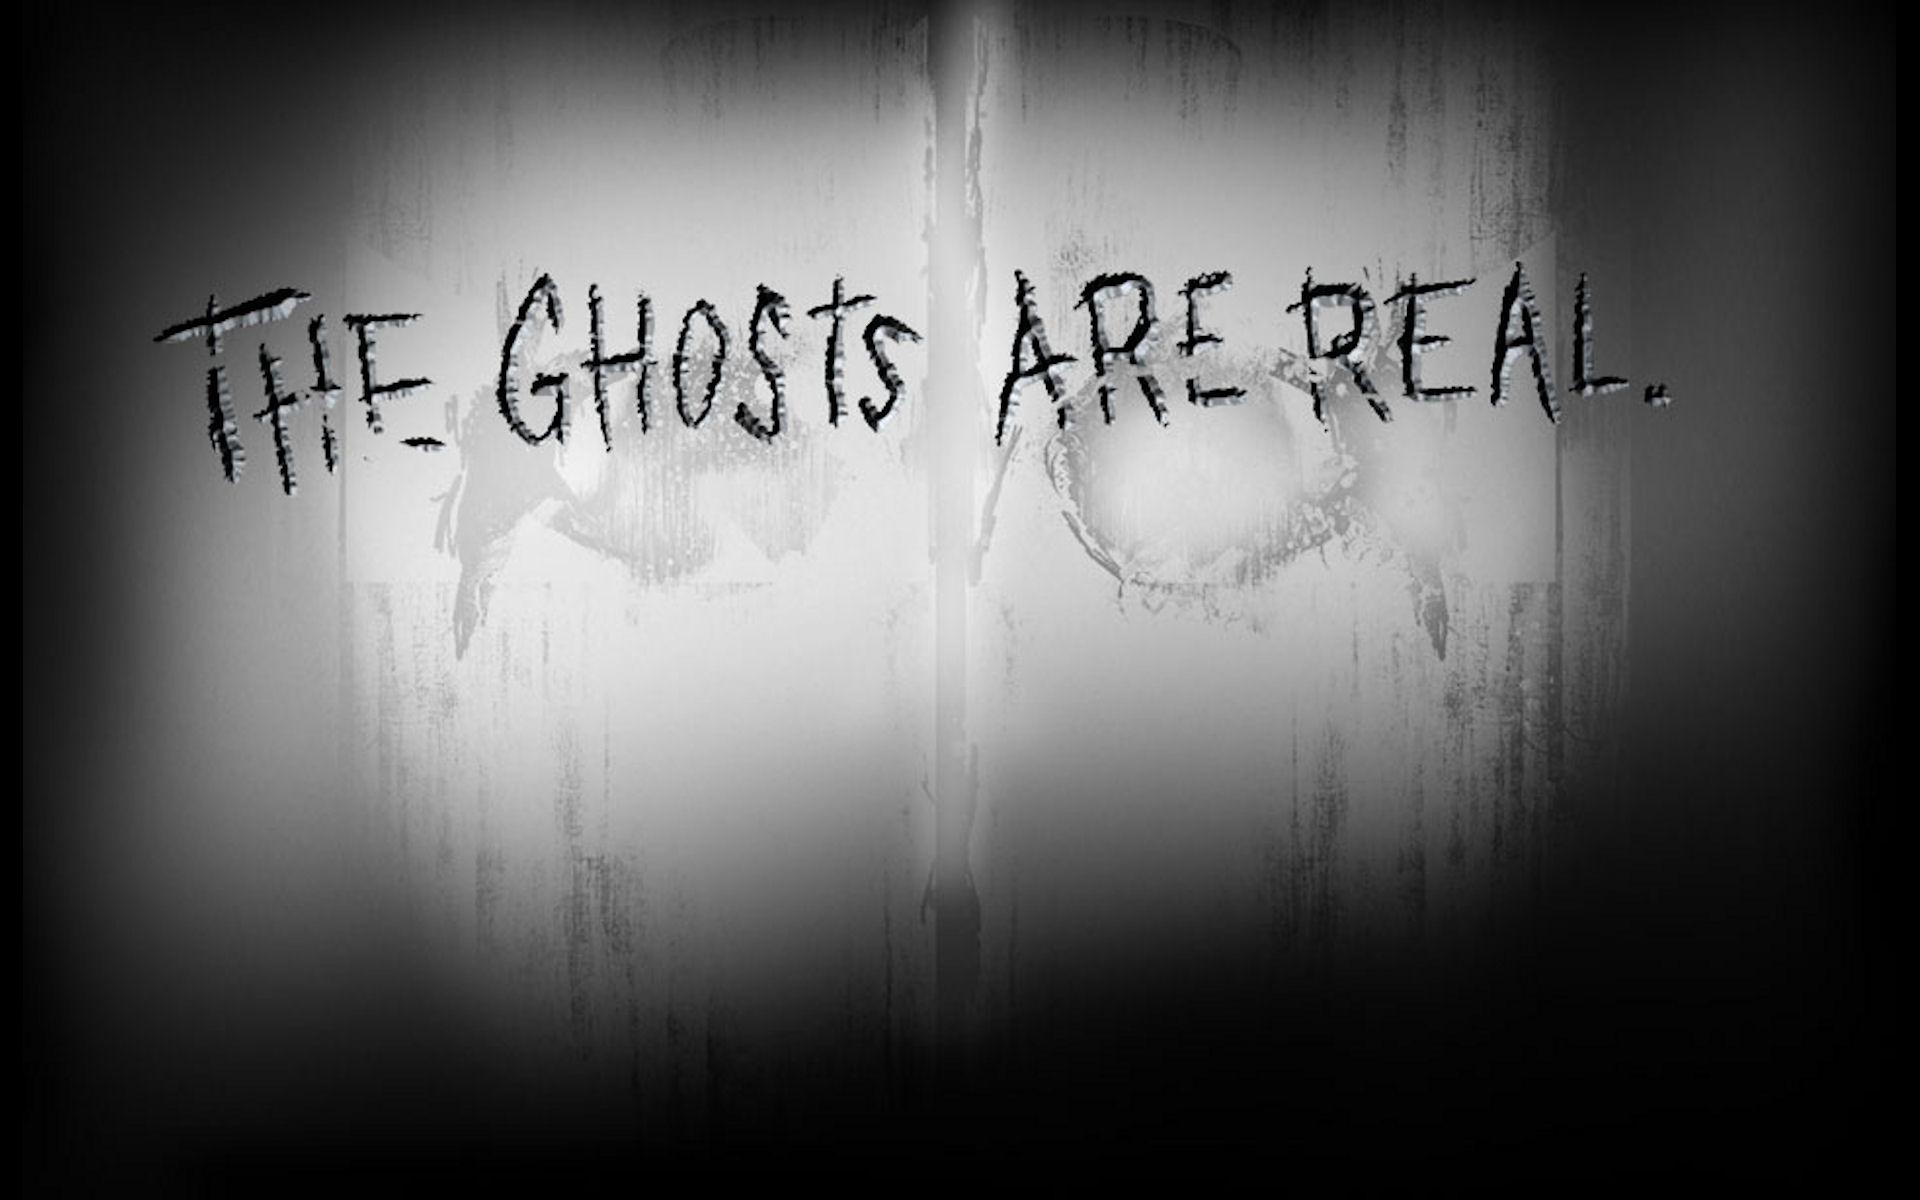 Call Of Duty Ghosts Slogan Wallpaper